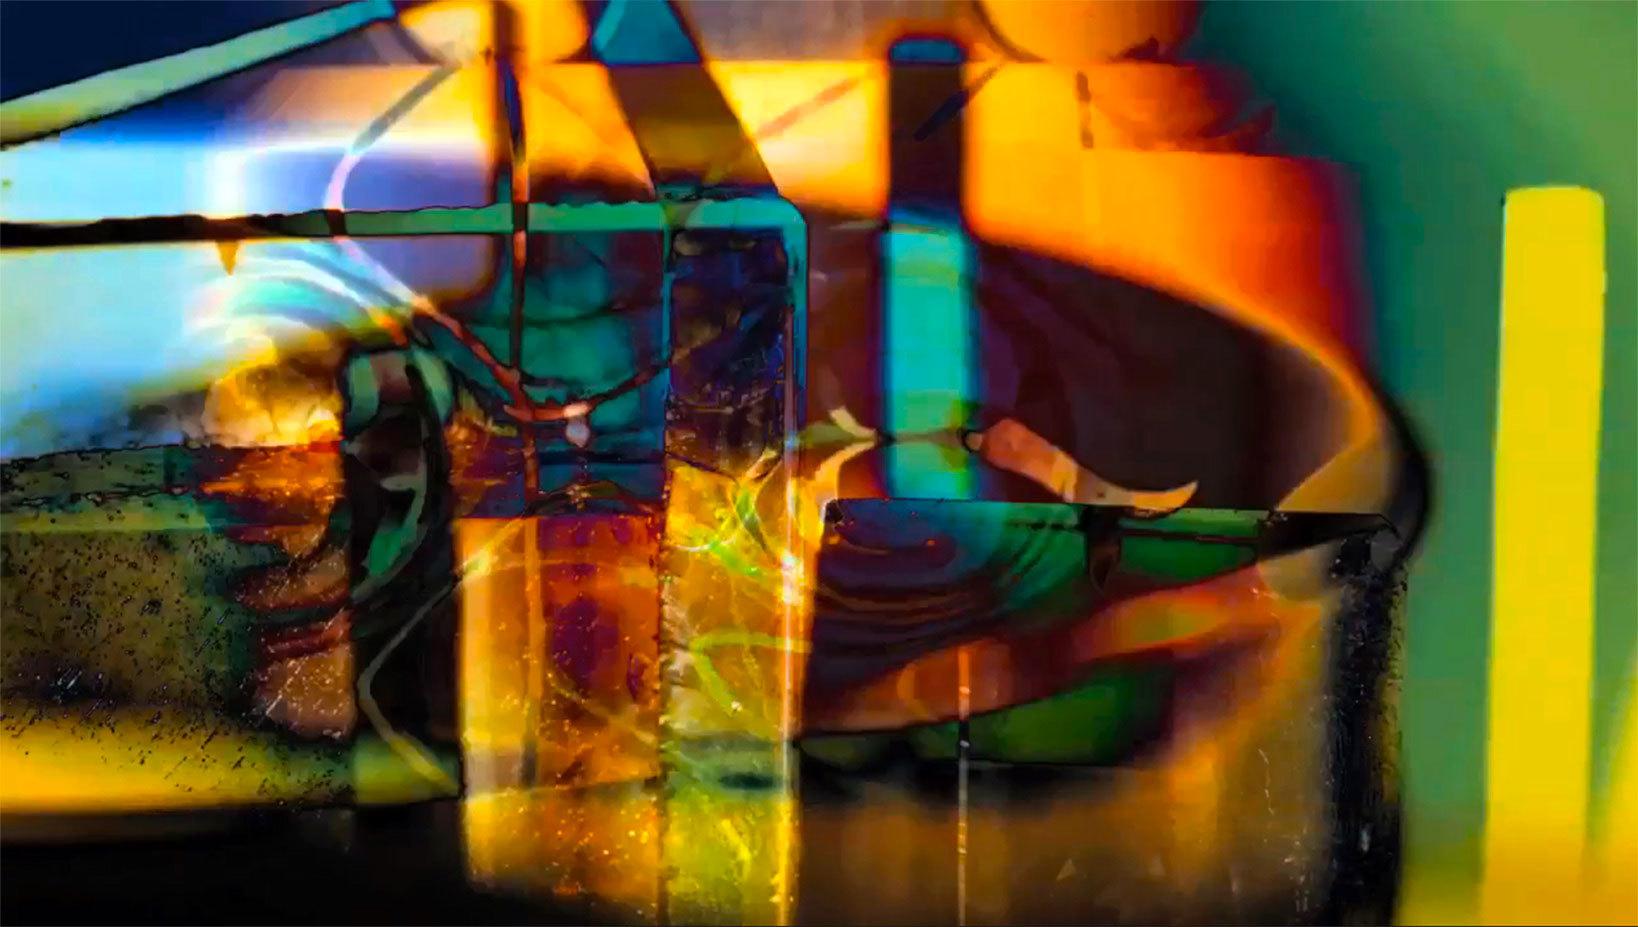 Laberinto de luz, de Eugenio Polgovsky